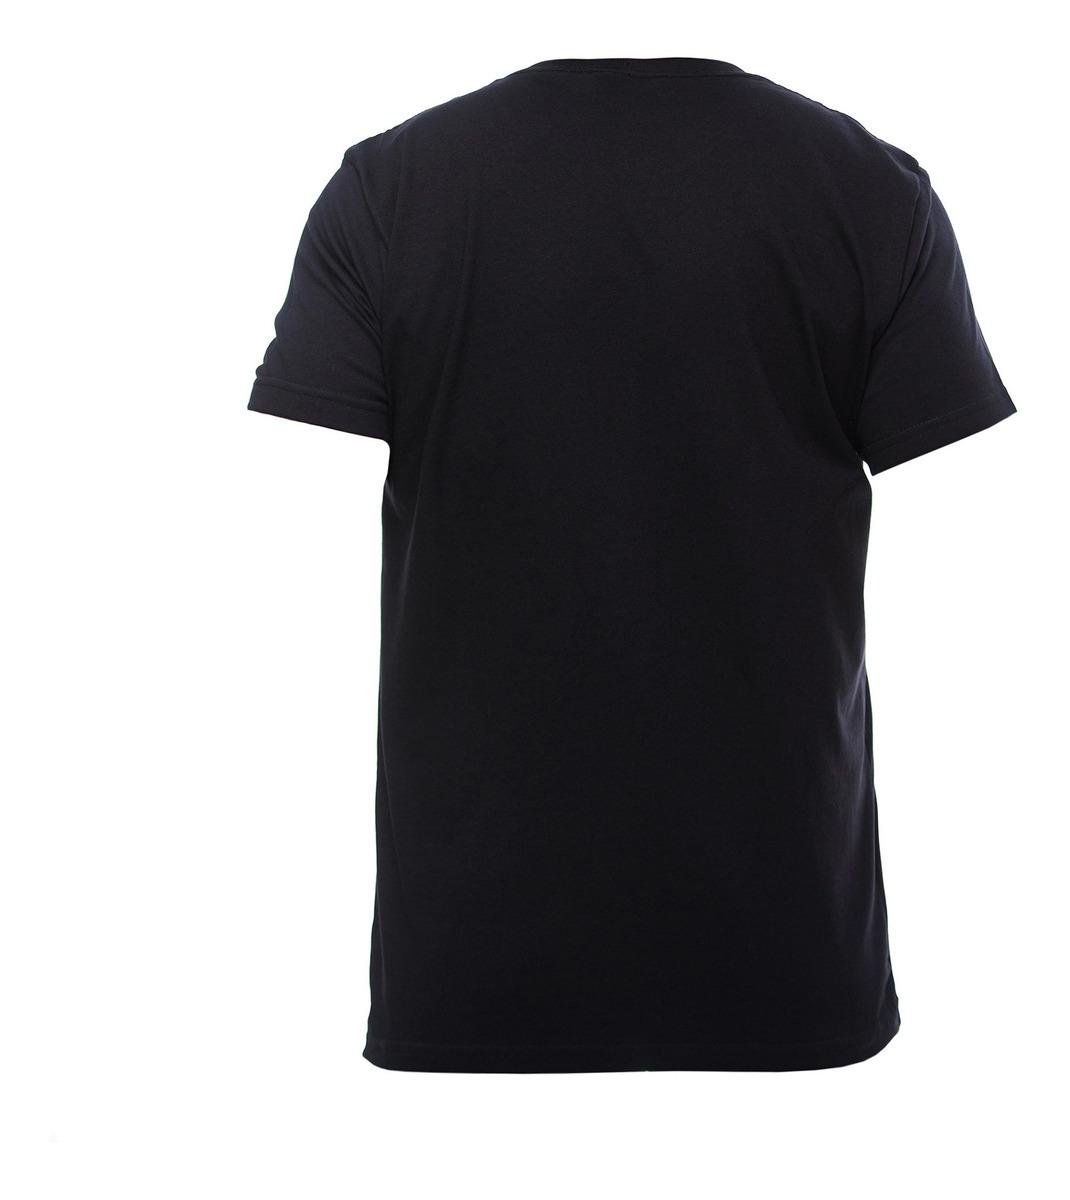 Camiseta Masculina King Farm Preto GCM155